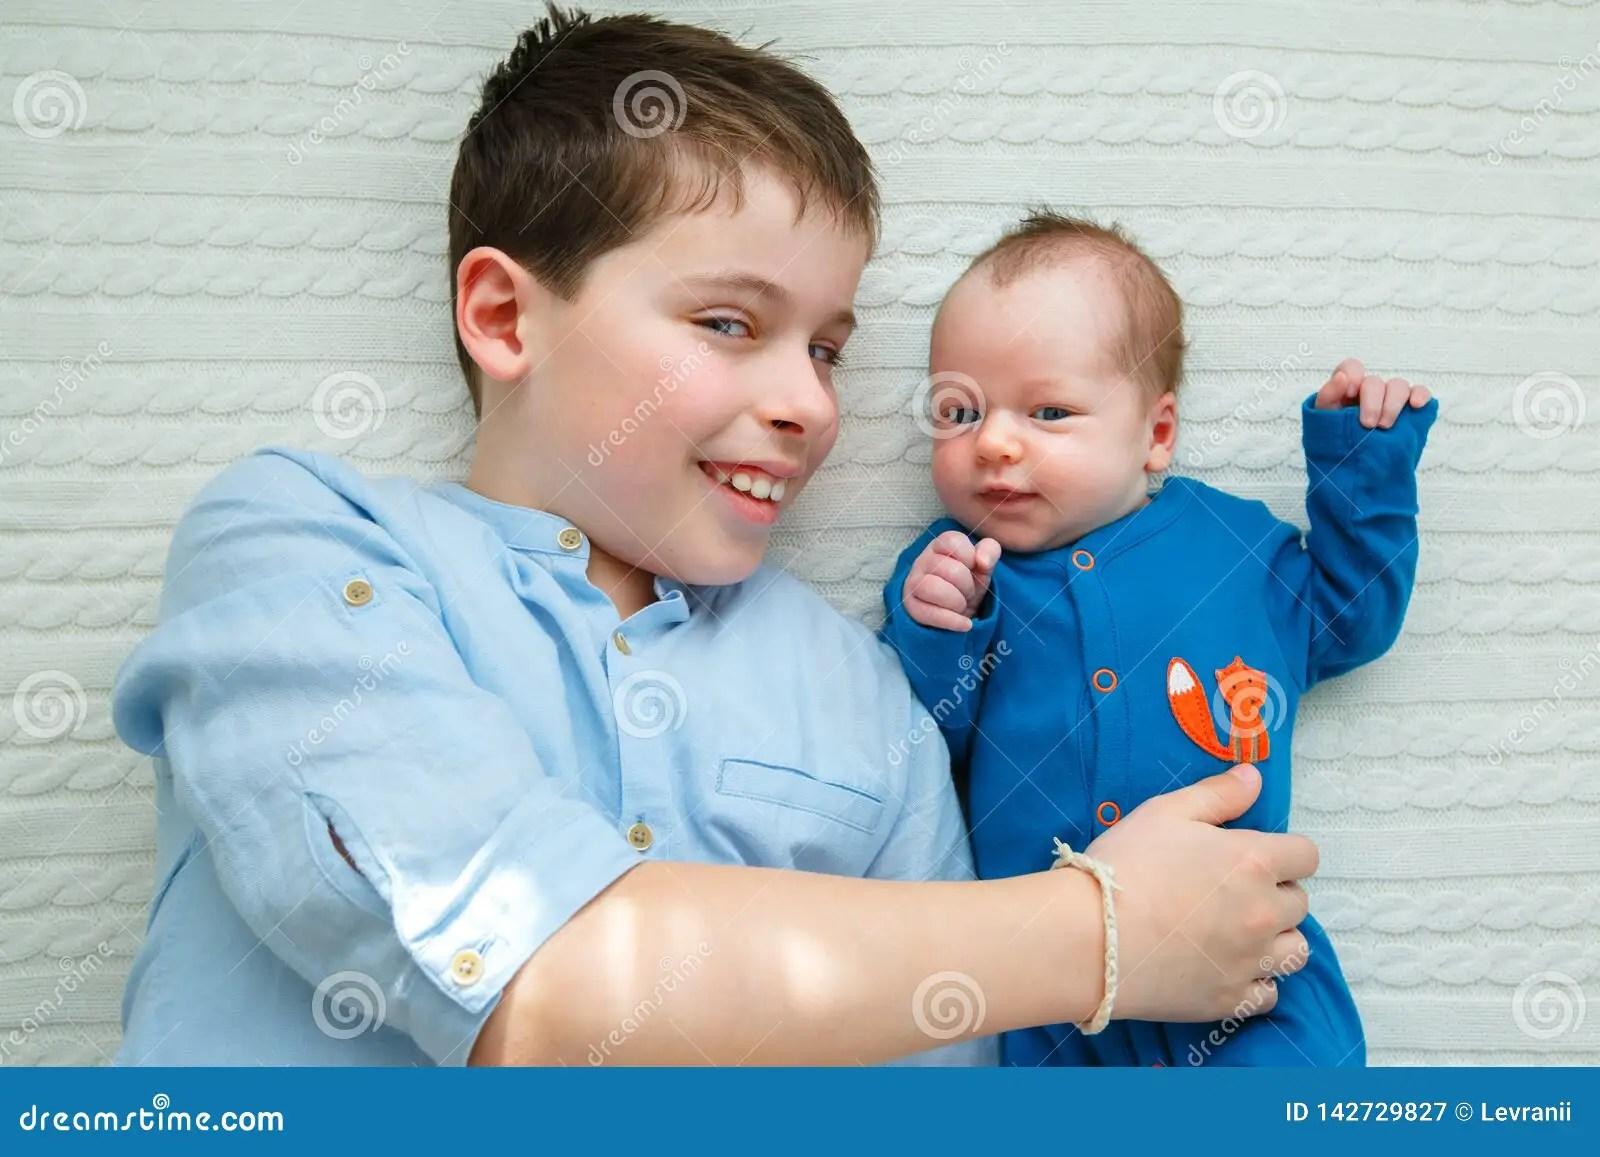 Big Brother Hugging His Newborn Baby Girl Toddler Kid